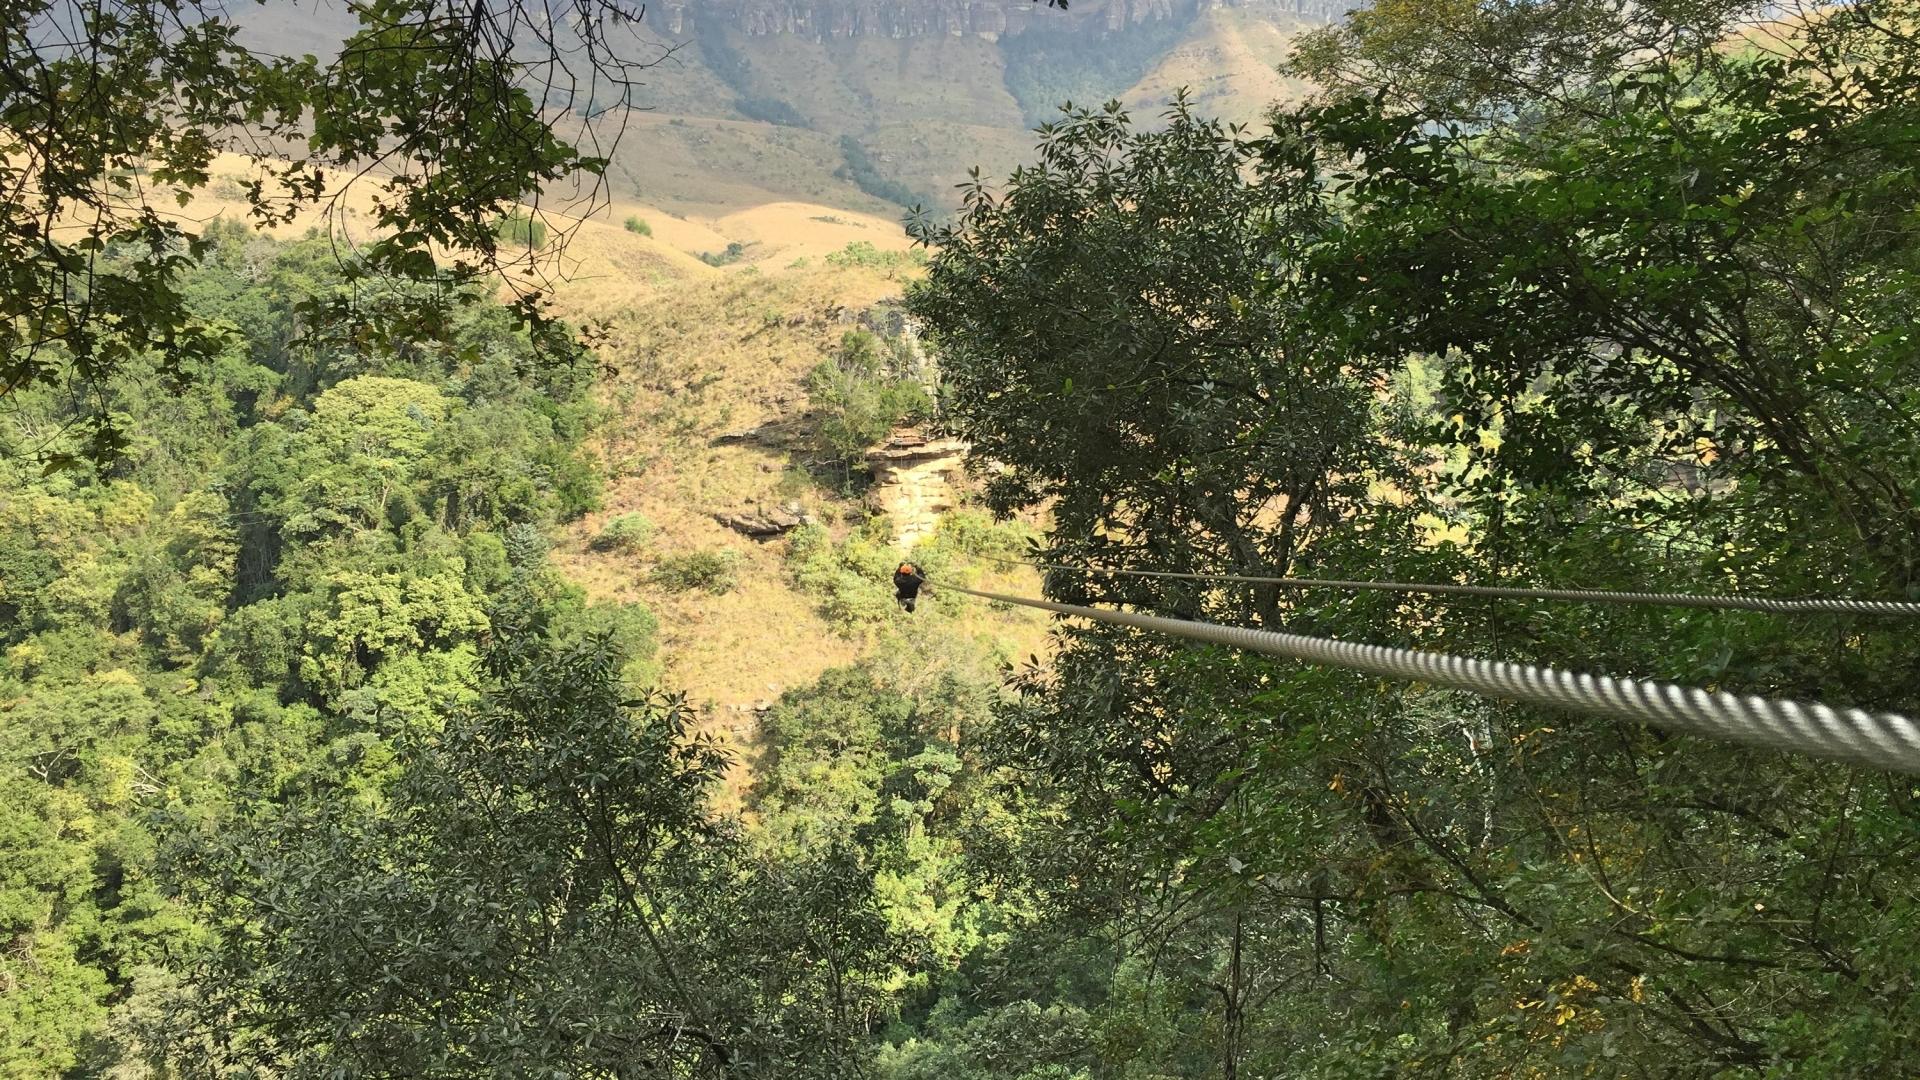 canopy-tour-zipline-zuid-afrika